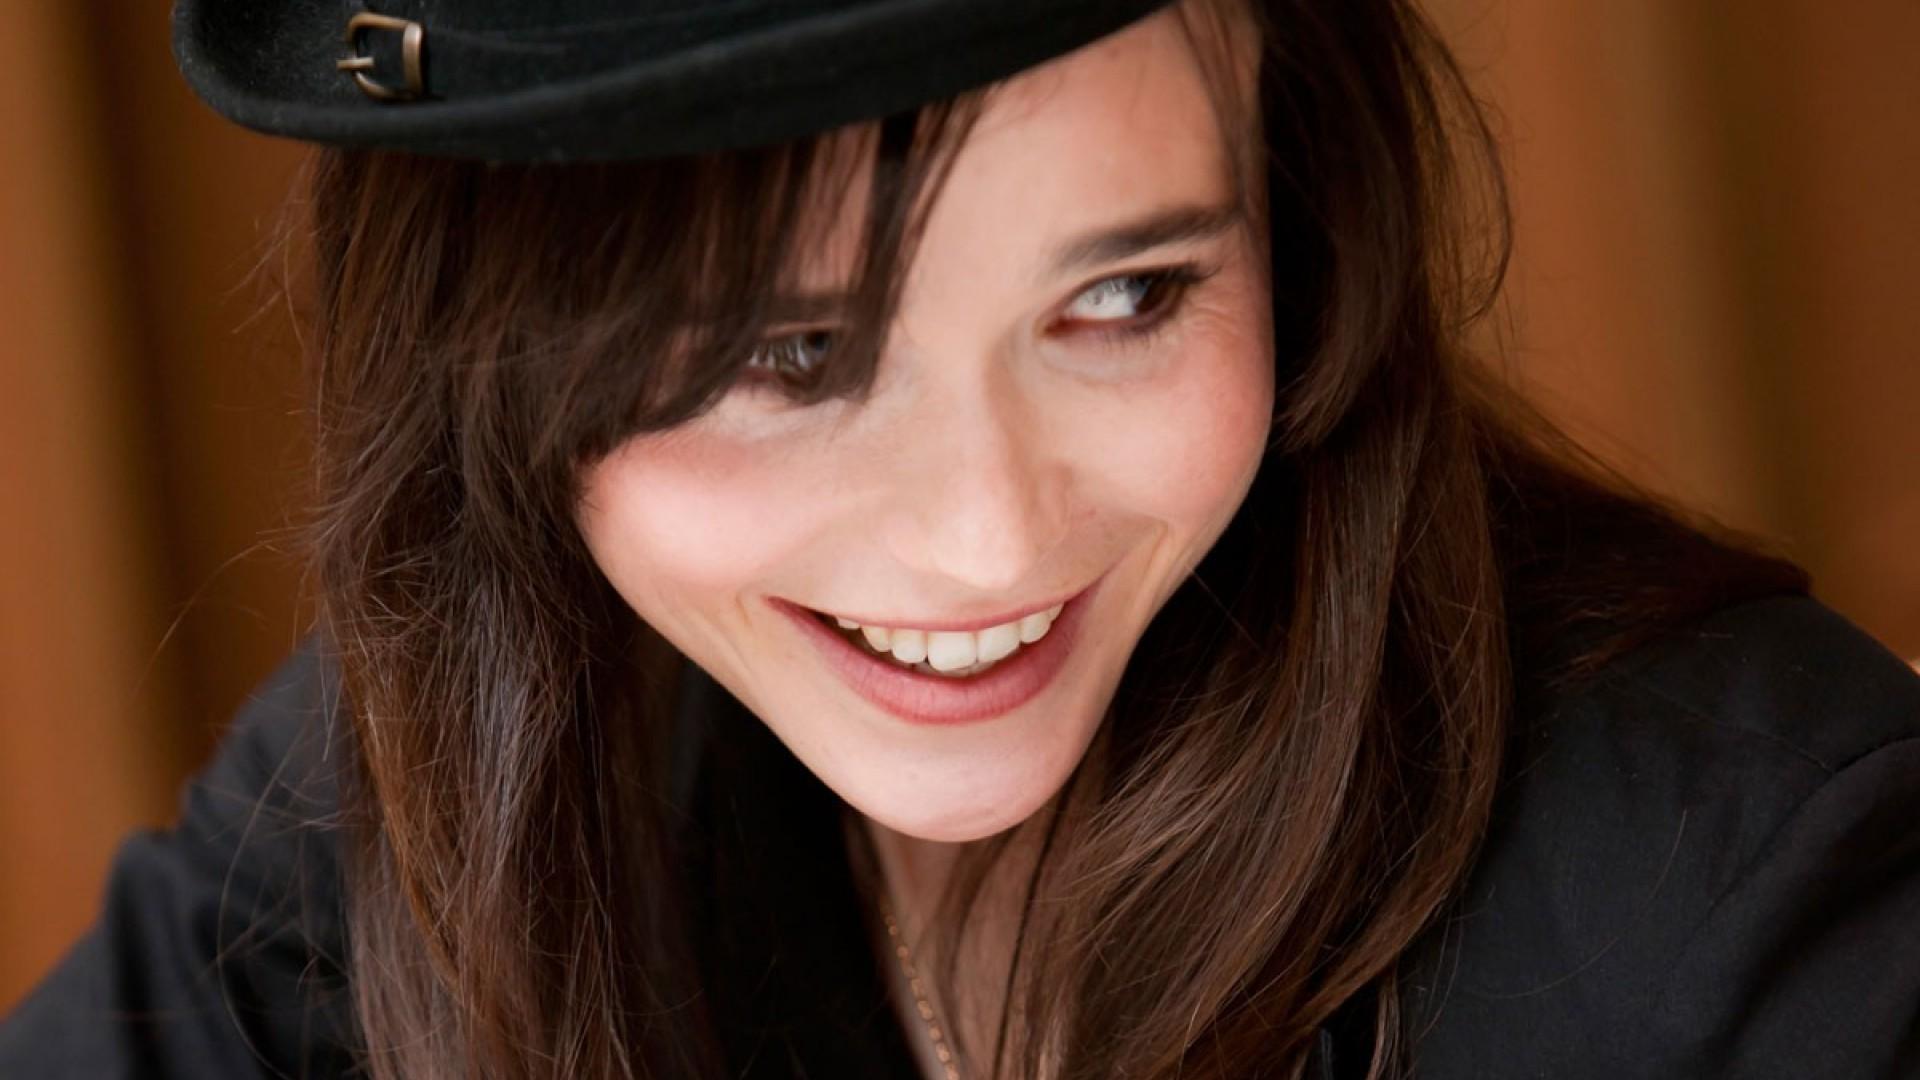 Cute Kitty Wallpapers Download Beautiful Ellen Page 31517 1920x1080 Px Hdwallsource Com